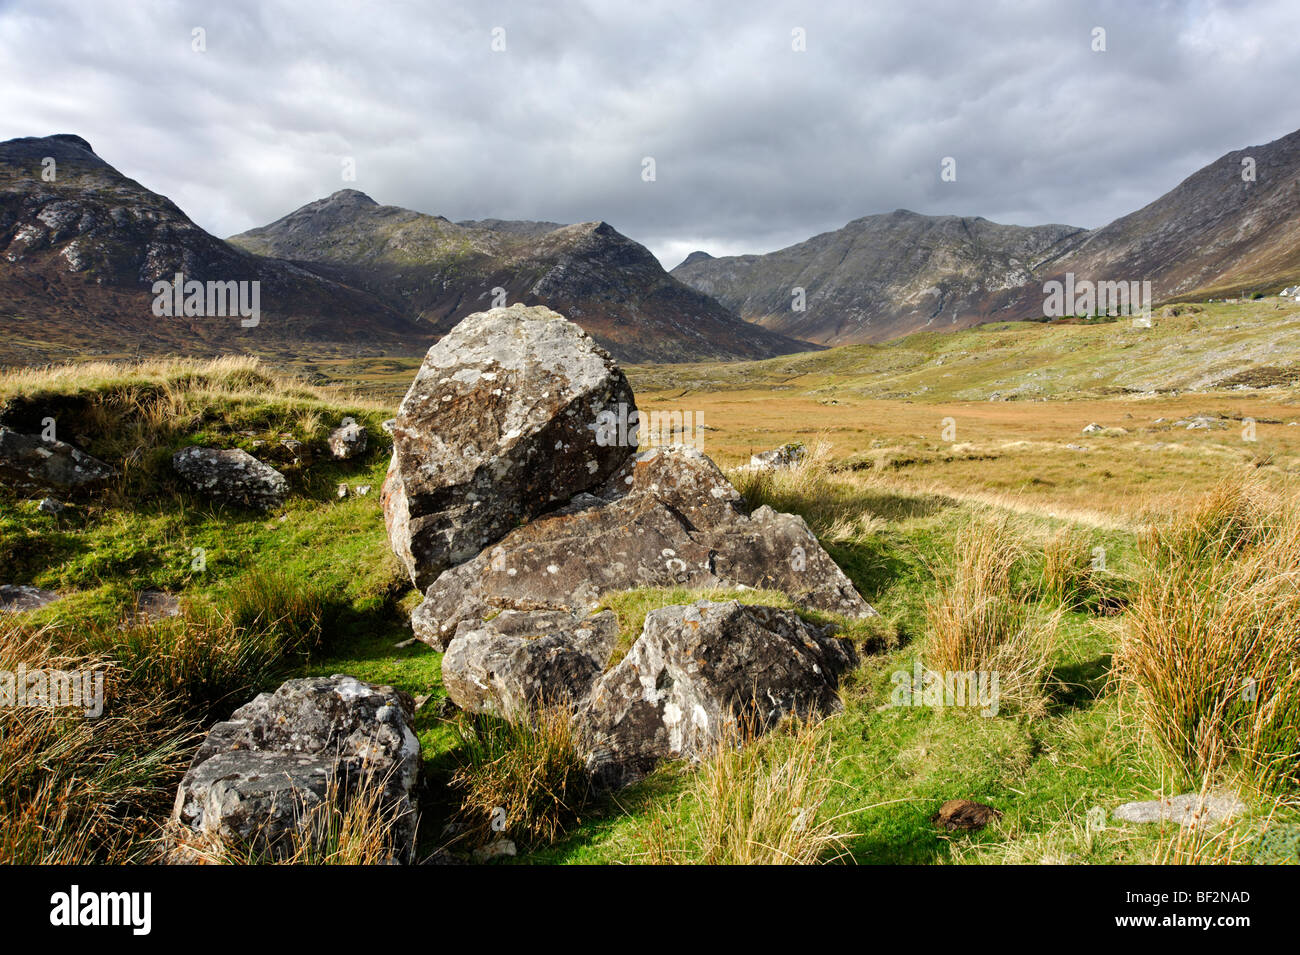 The Twelve Bens mountain range. Connemara. Co Galway. Ireland 2009. Stock Photo